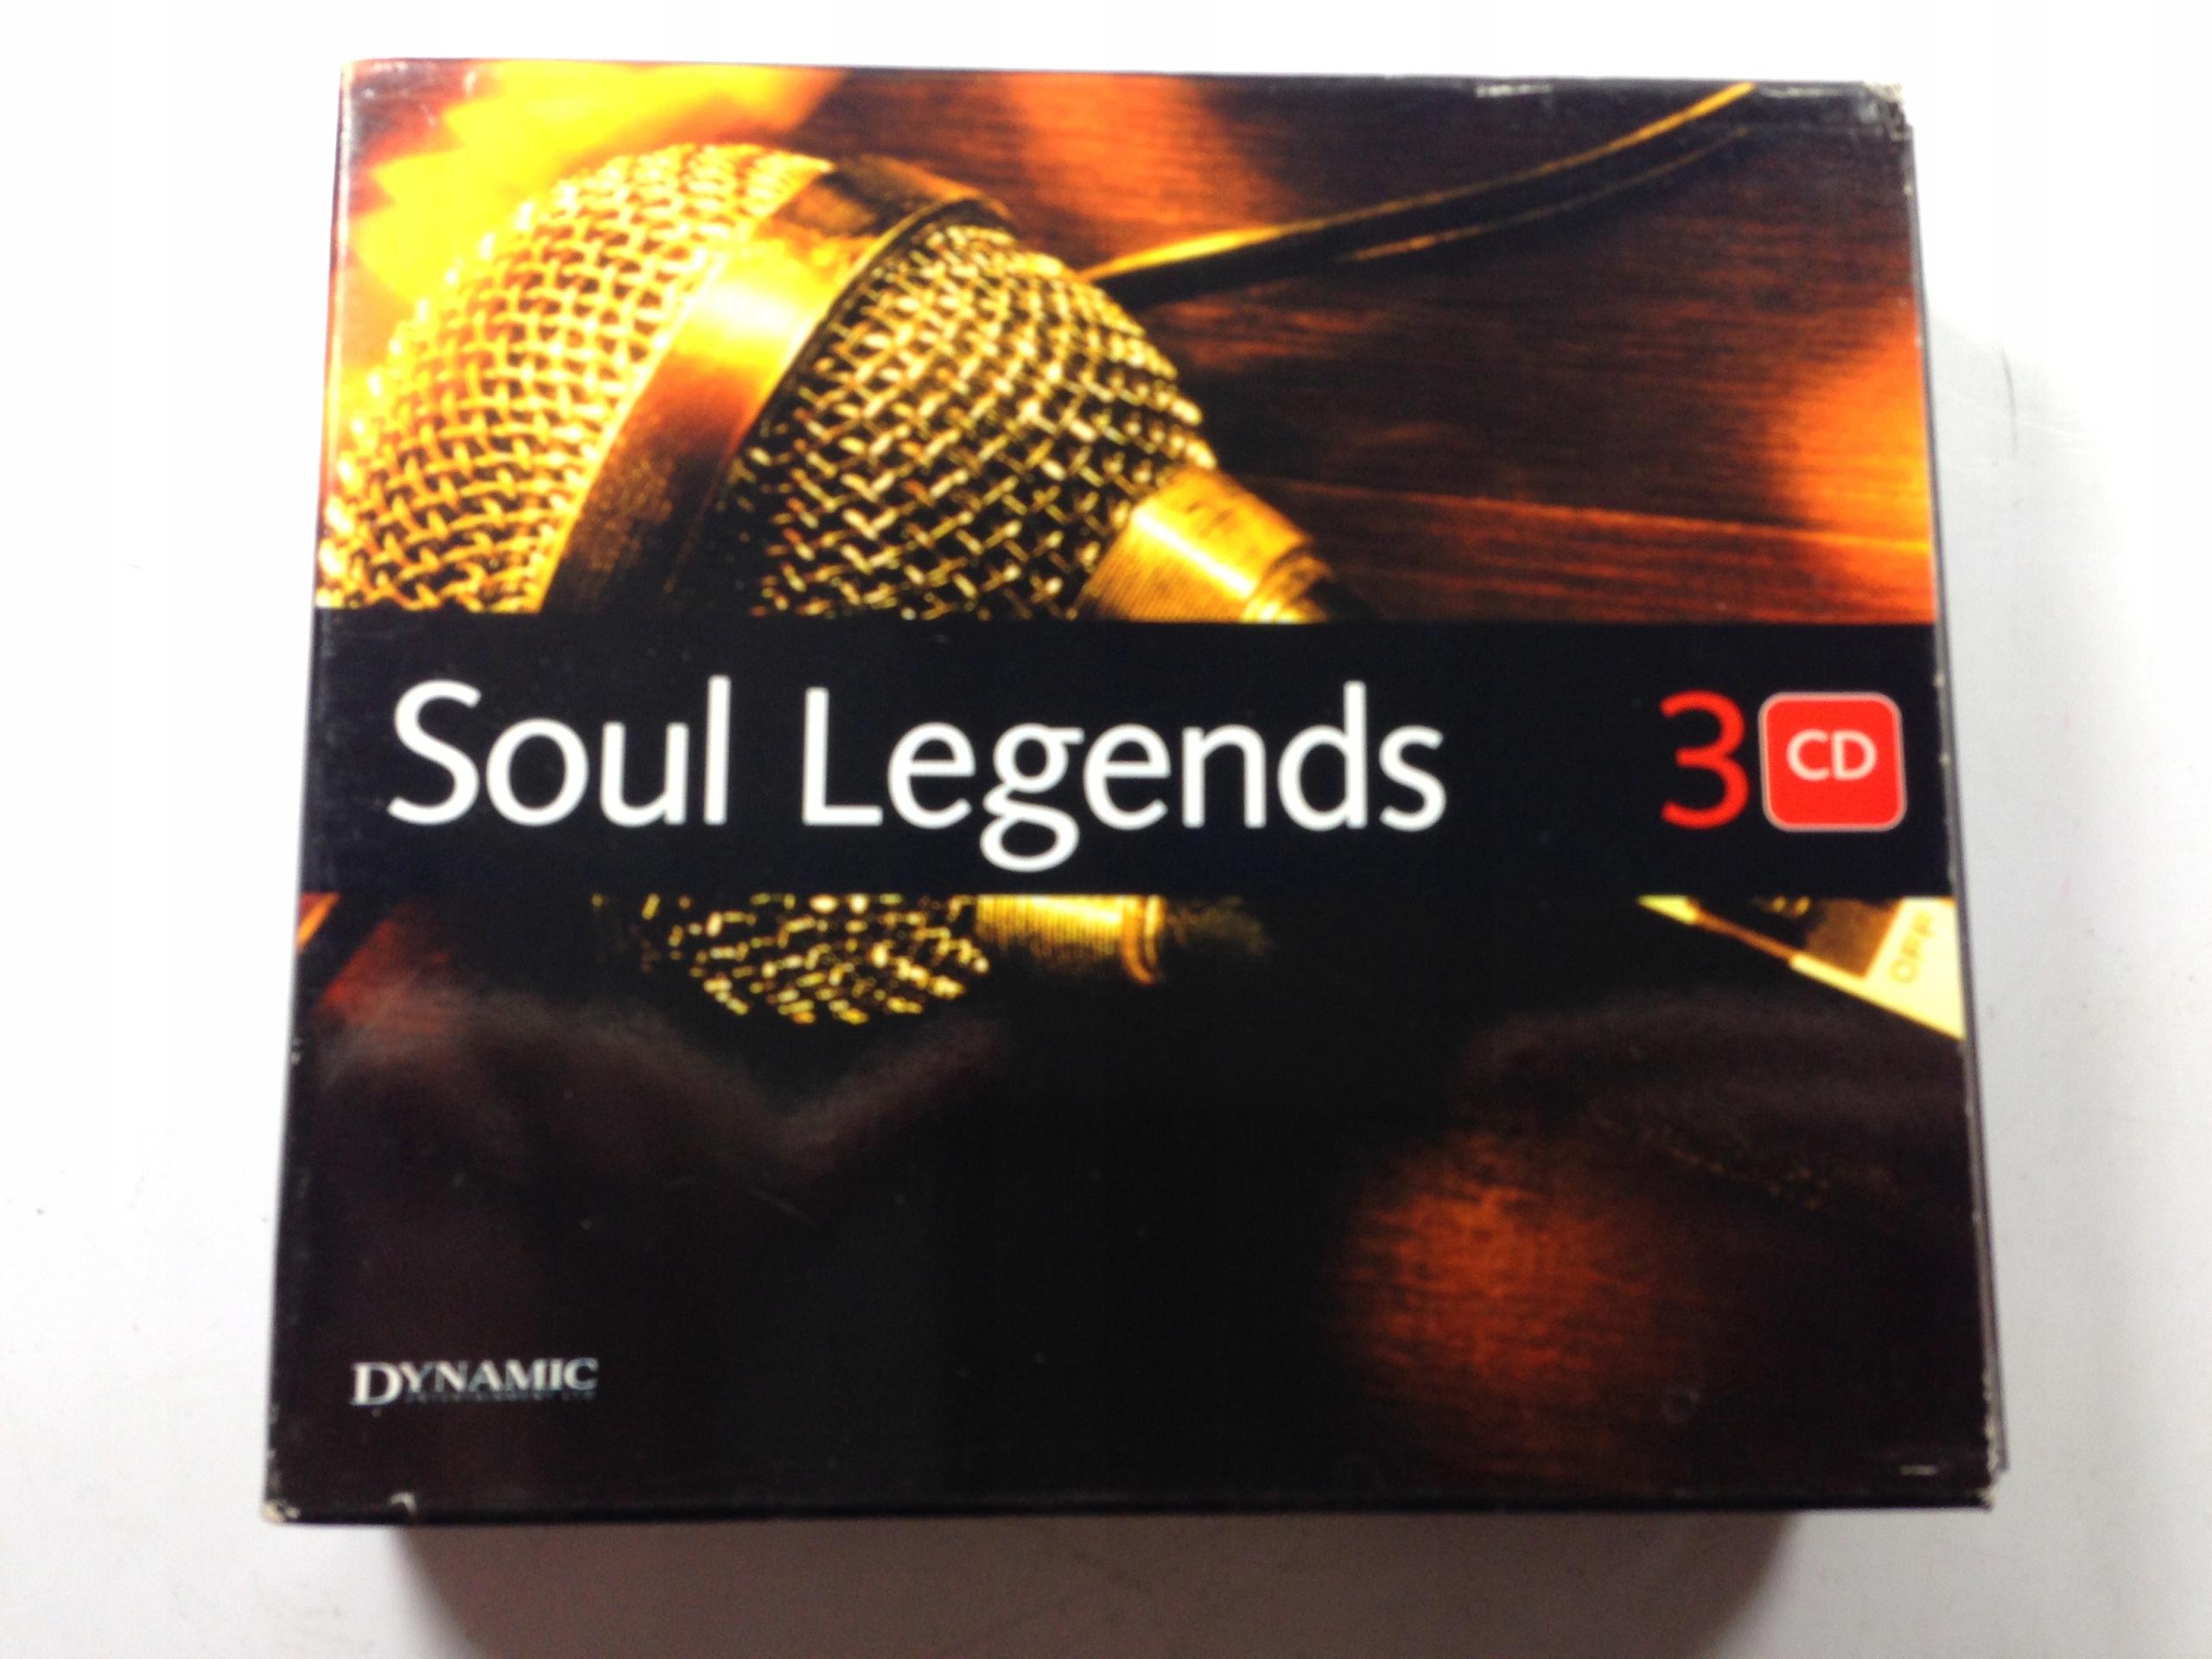 SOUL LEGENDS 3 CD